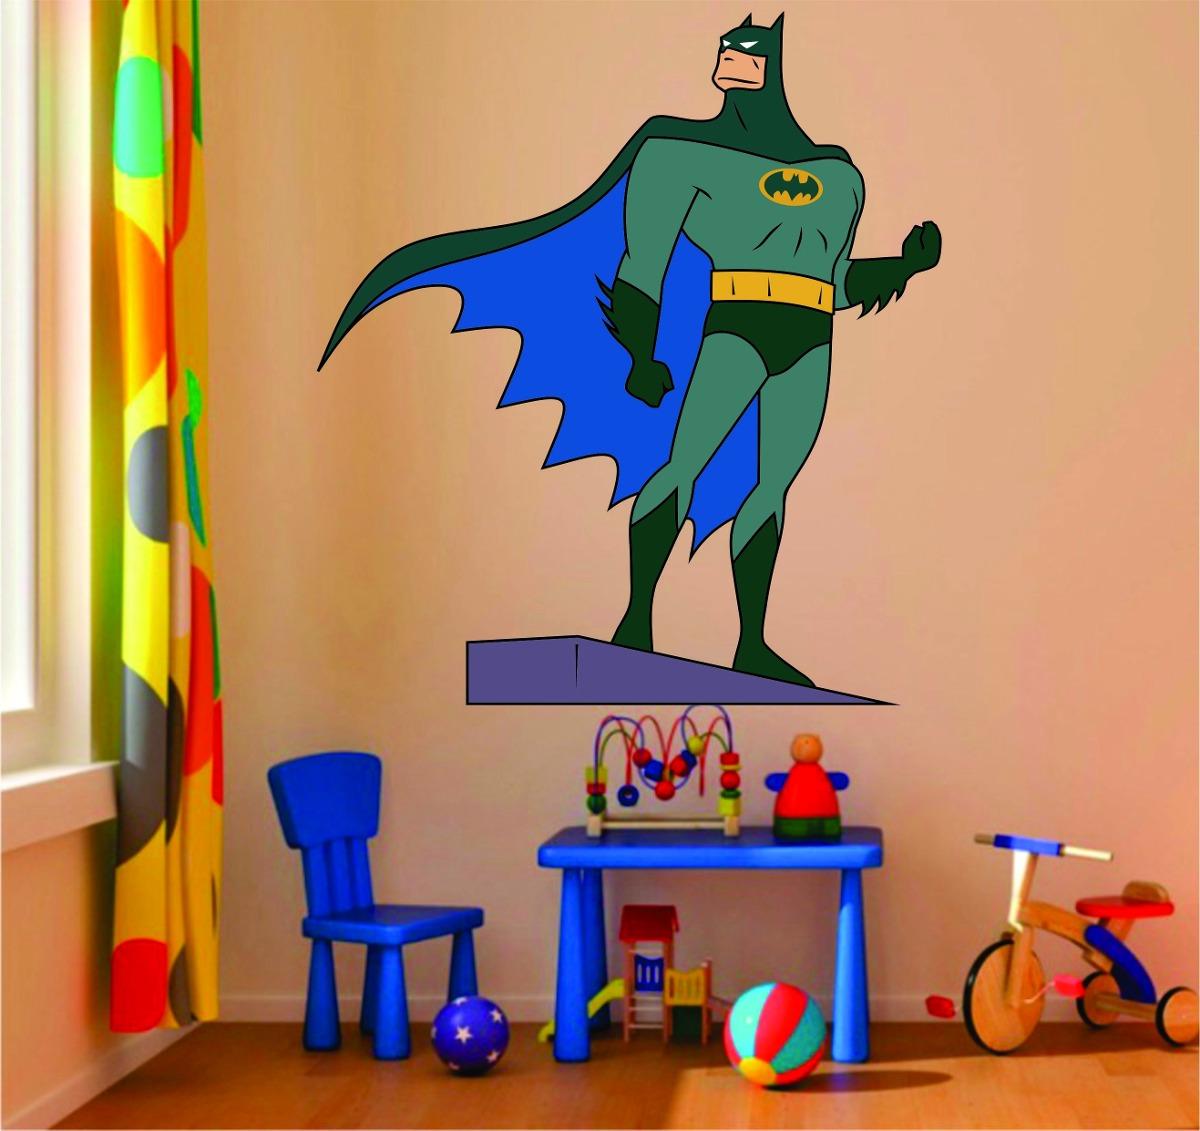 20170115194907_adesivos Para Quarto De Super Herois Beigit Com ~ Tecidos Para Parede De Quarto E Quarto Bebe Super Herois